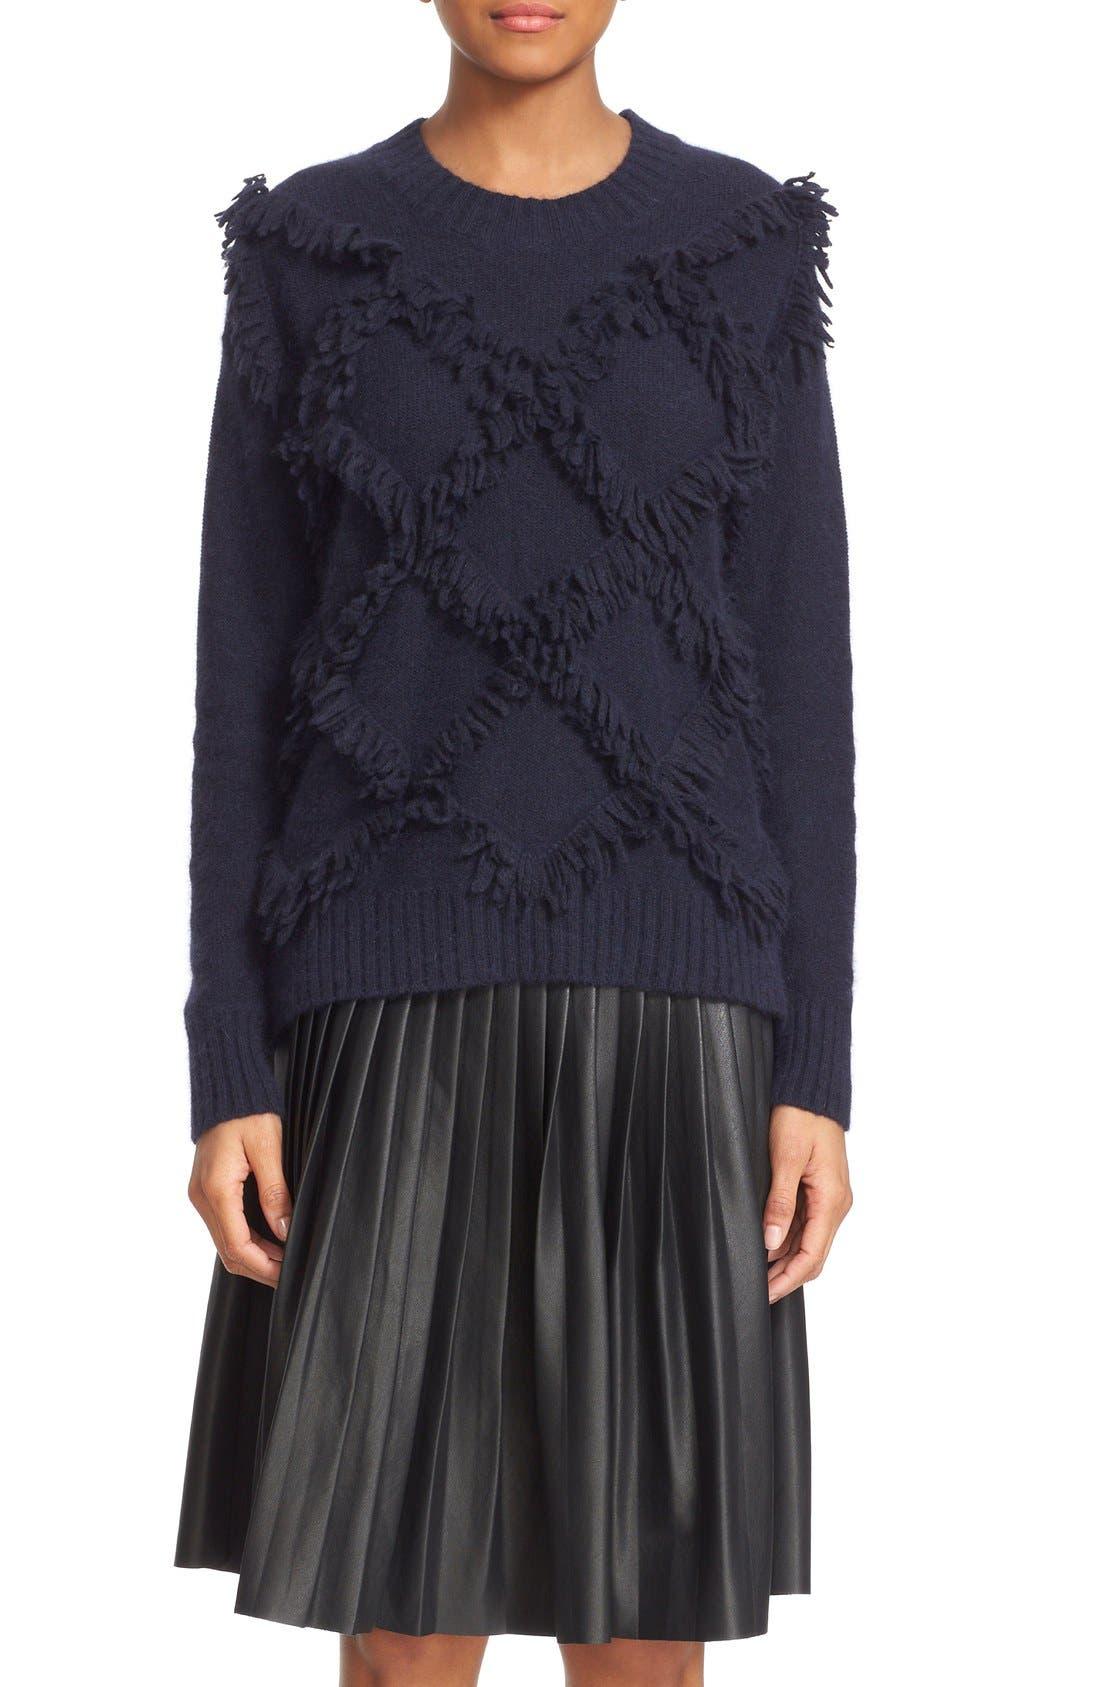 Alternate Image 1 Selected - Rebecca Taylor Fringe Pullover Sweater